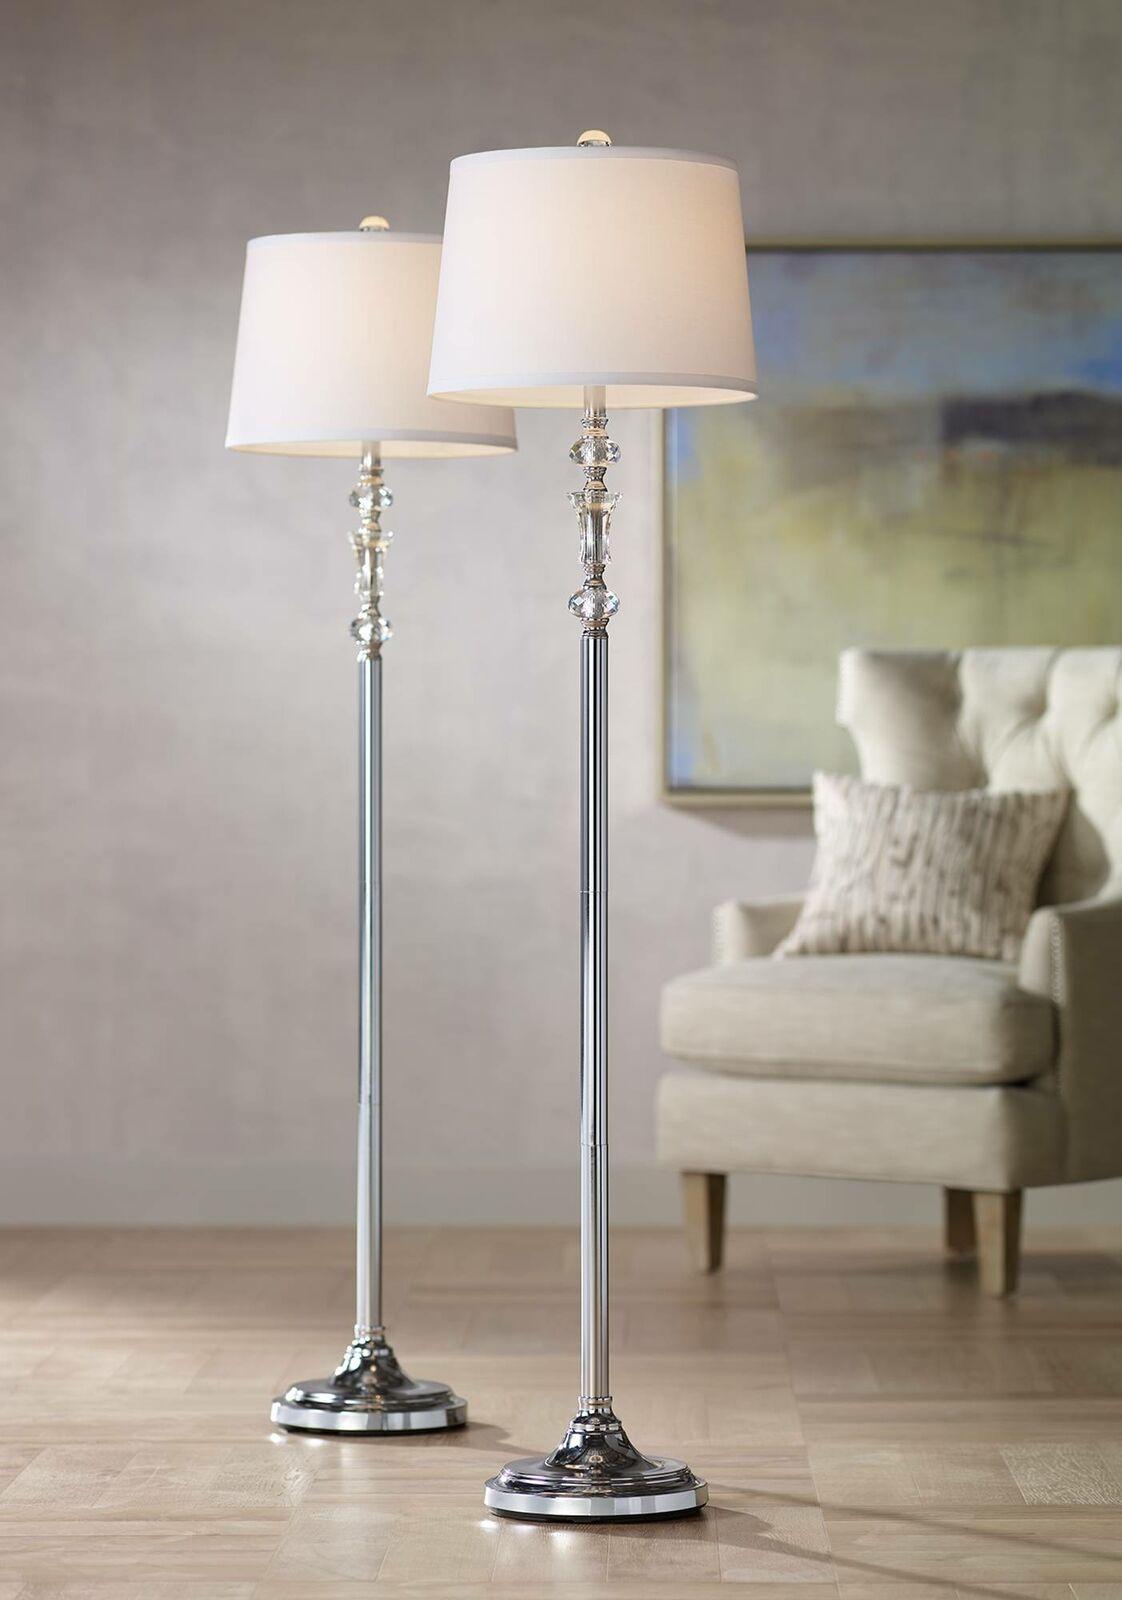 Picture of: Modern Floor Lamps Set Of 2 Polished Steel Crystal Glass For Living Room Bedroom For Sale Online